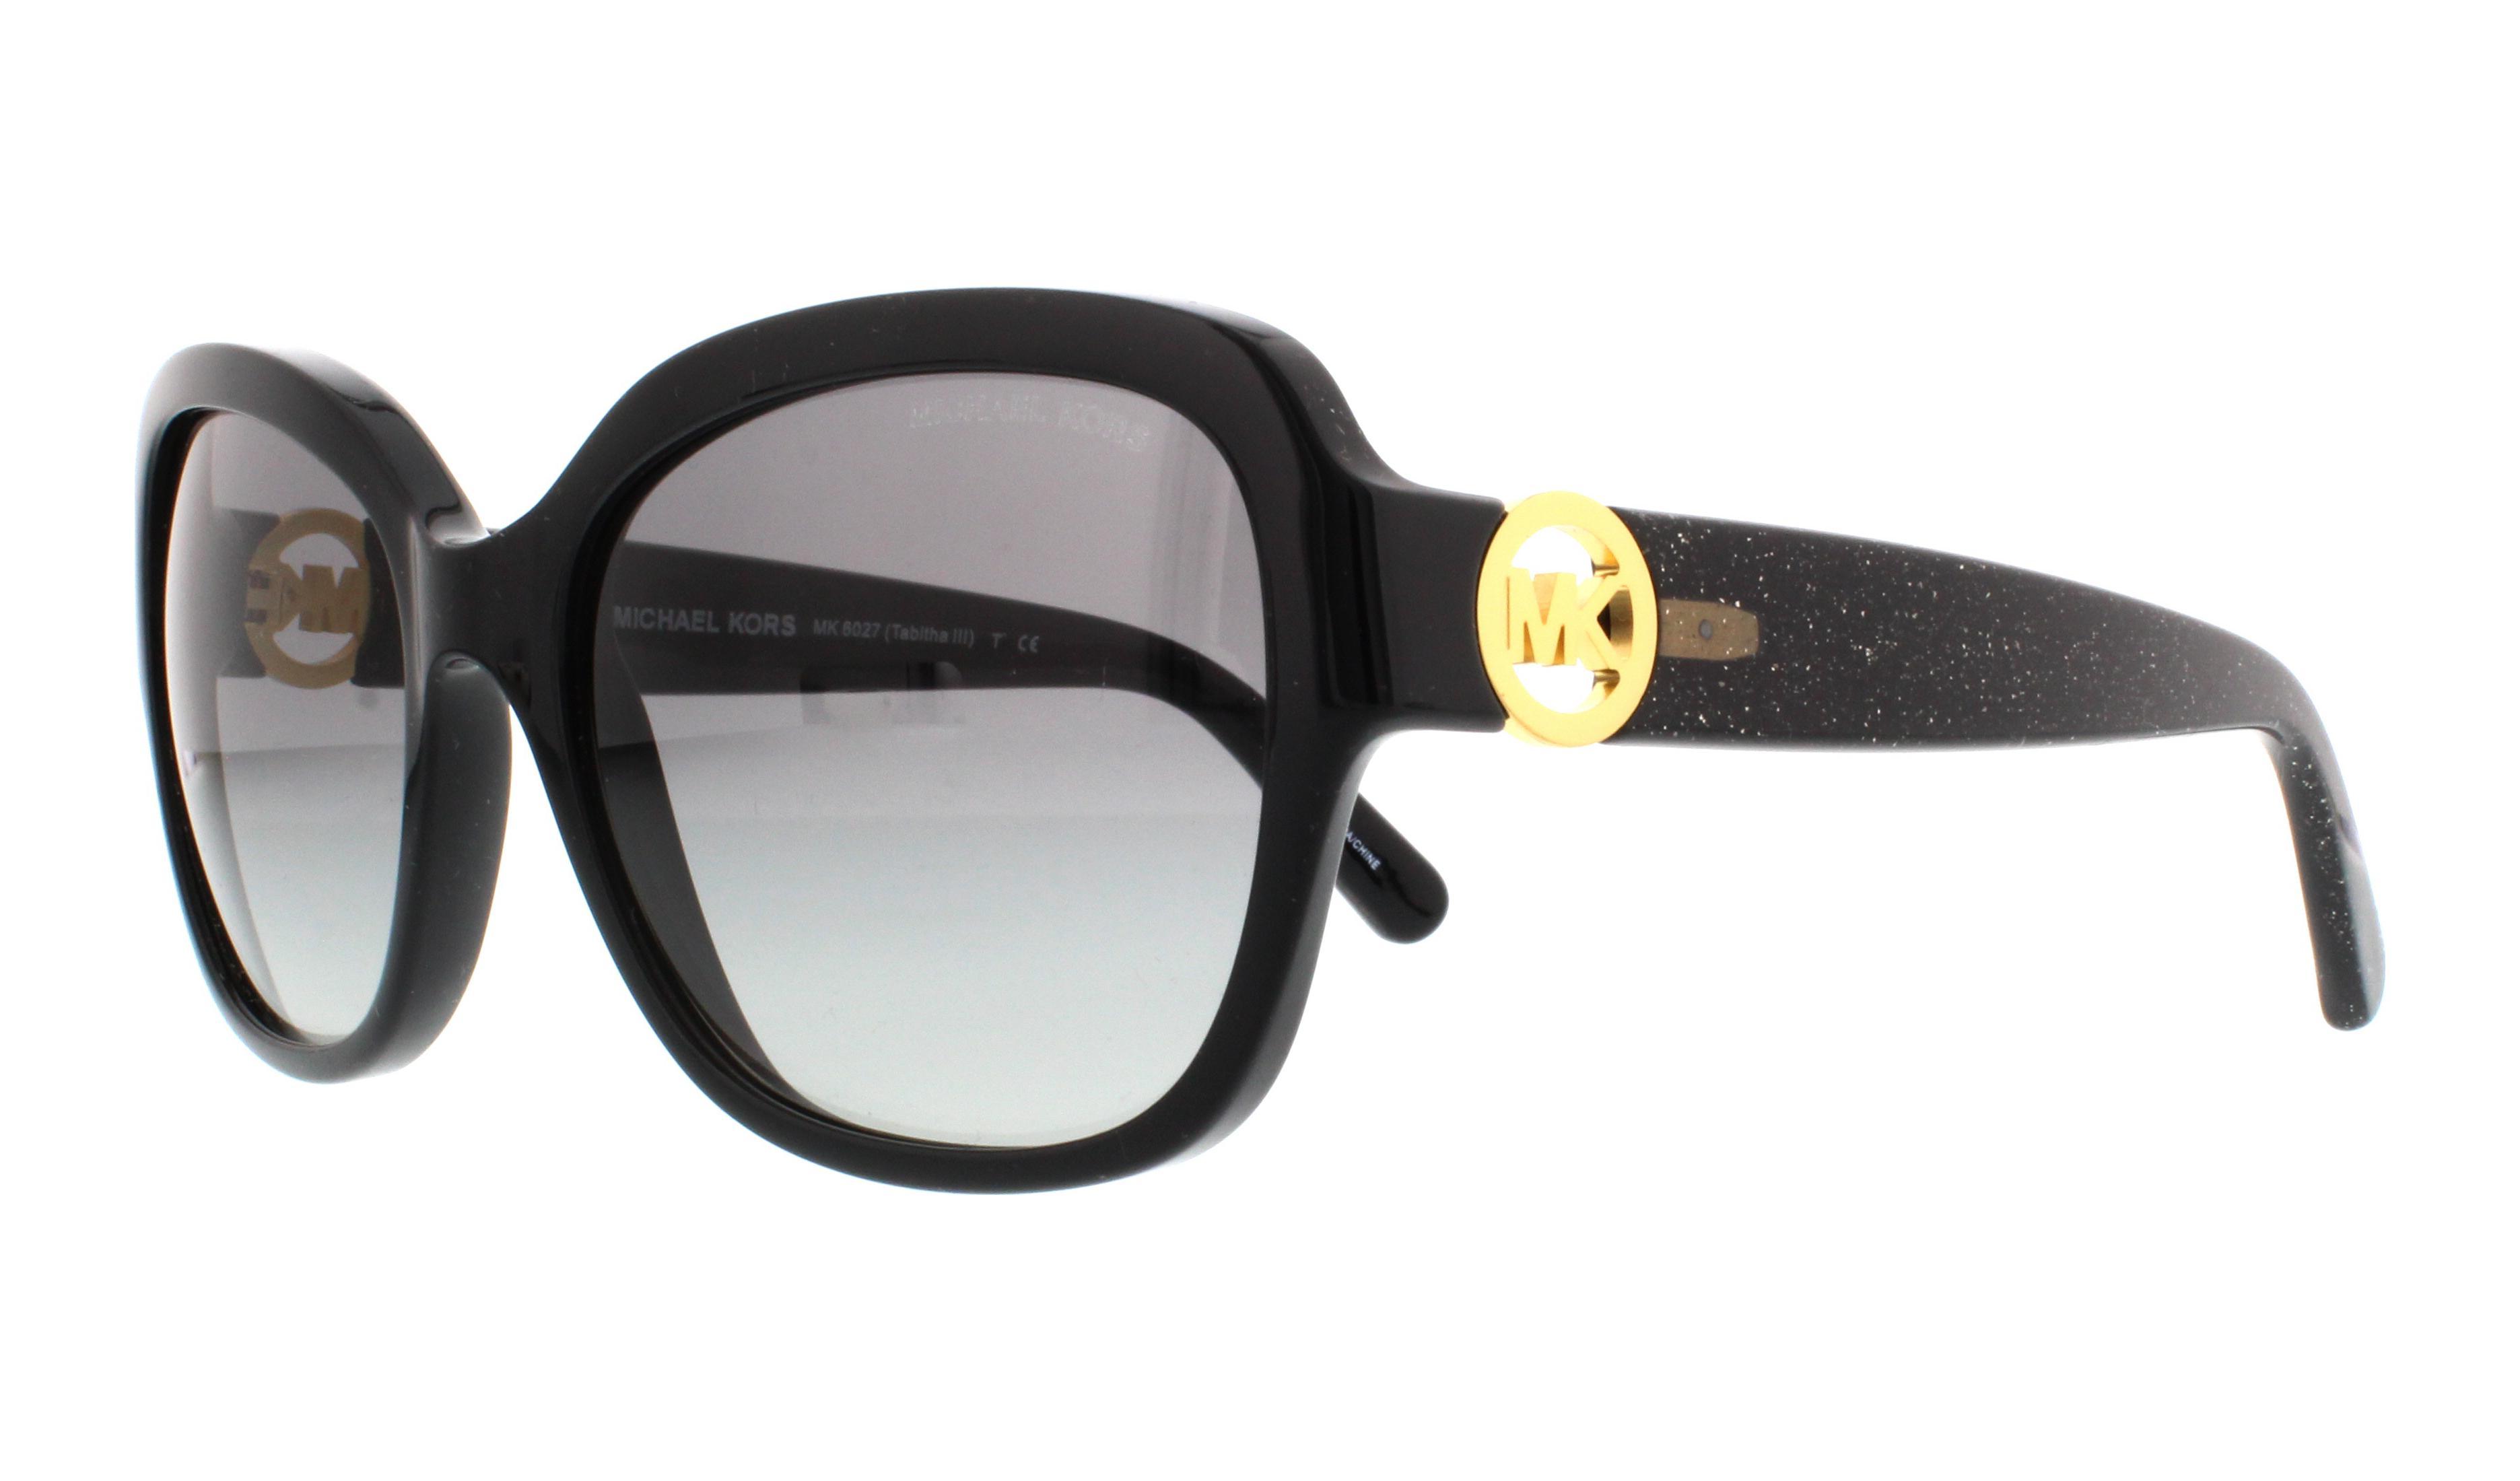 EYEWEAR - Sunglasses Michael Kors FMHa2Bq9